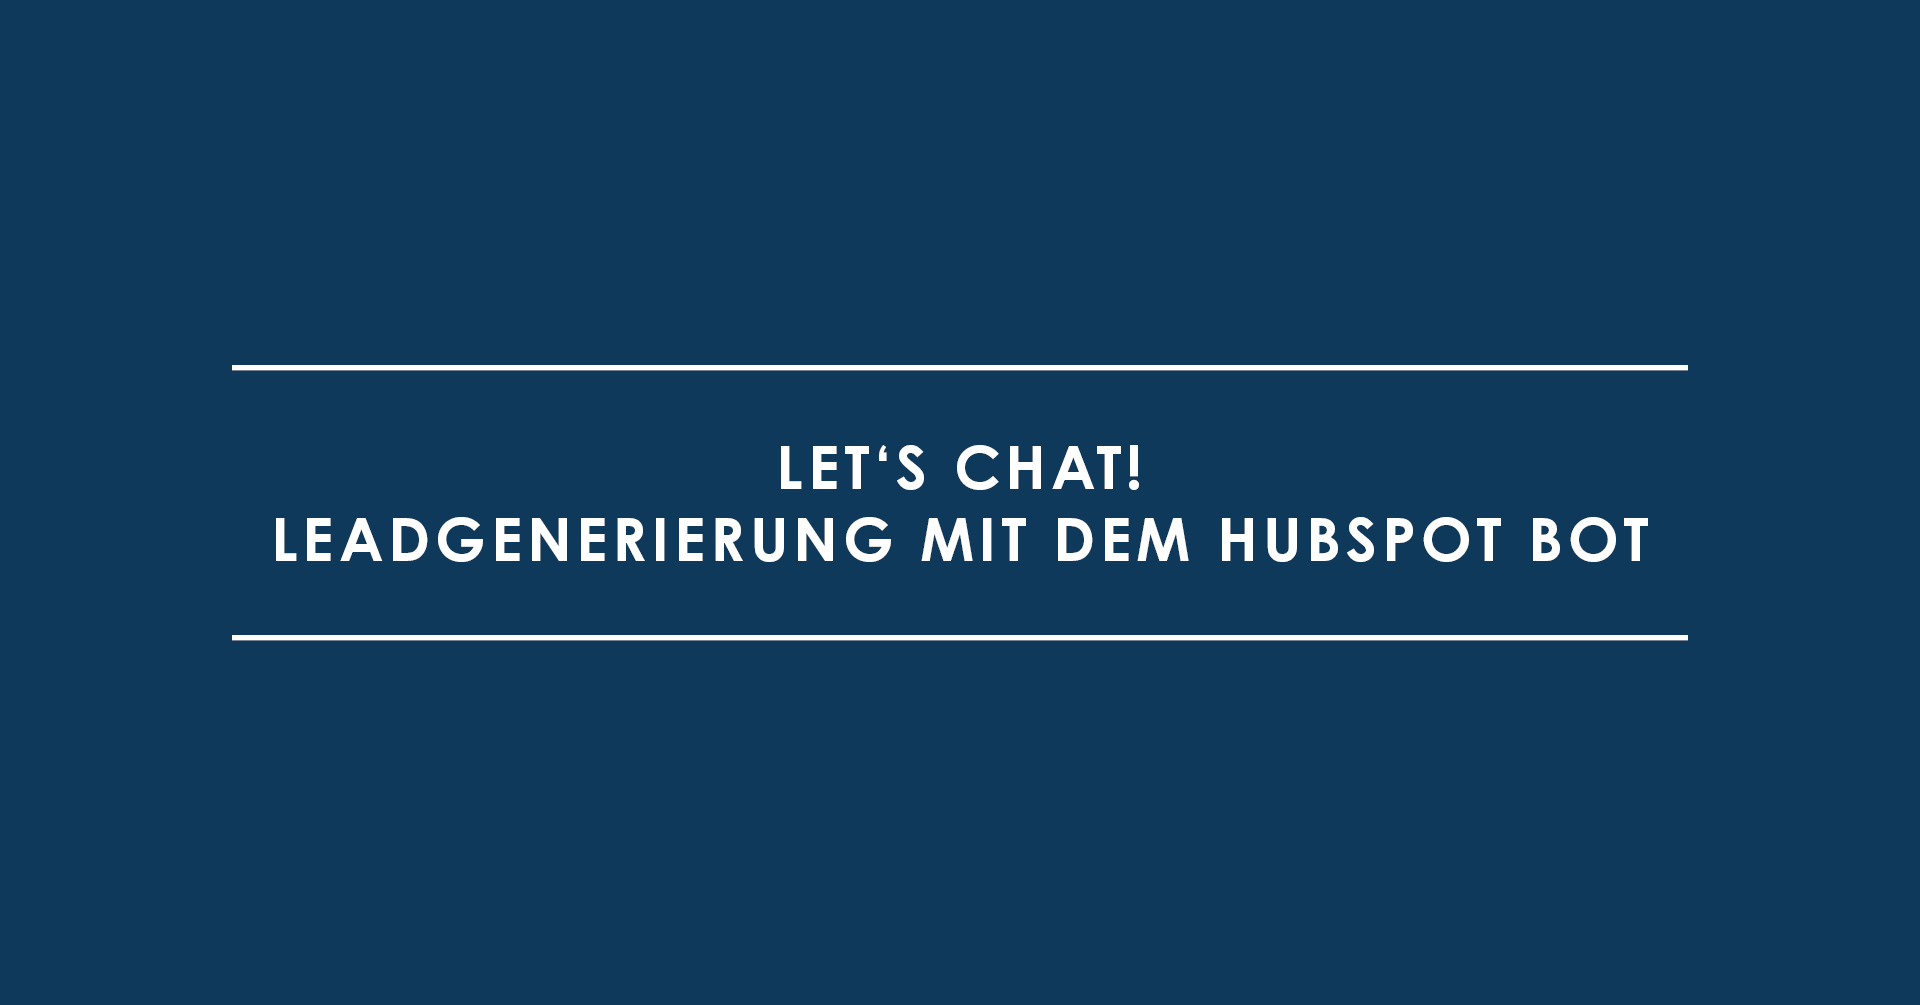 Let's Chat! Leadgenerierung mit dem HubSpot Bot